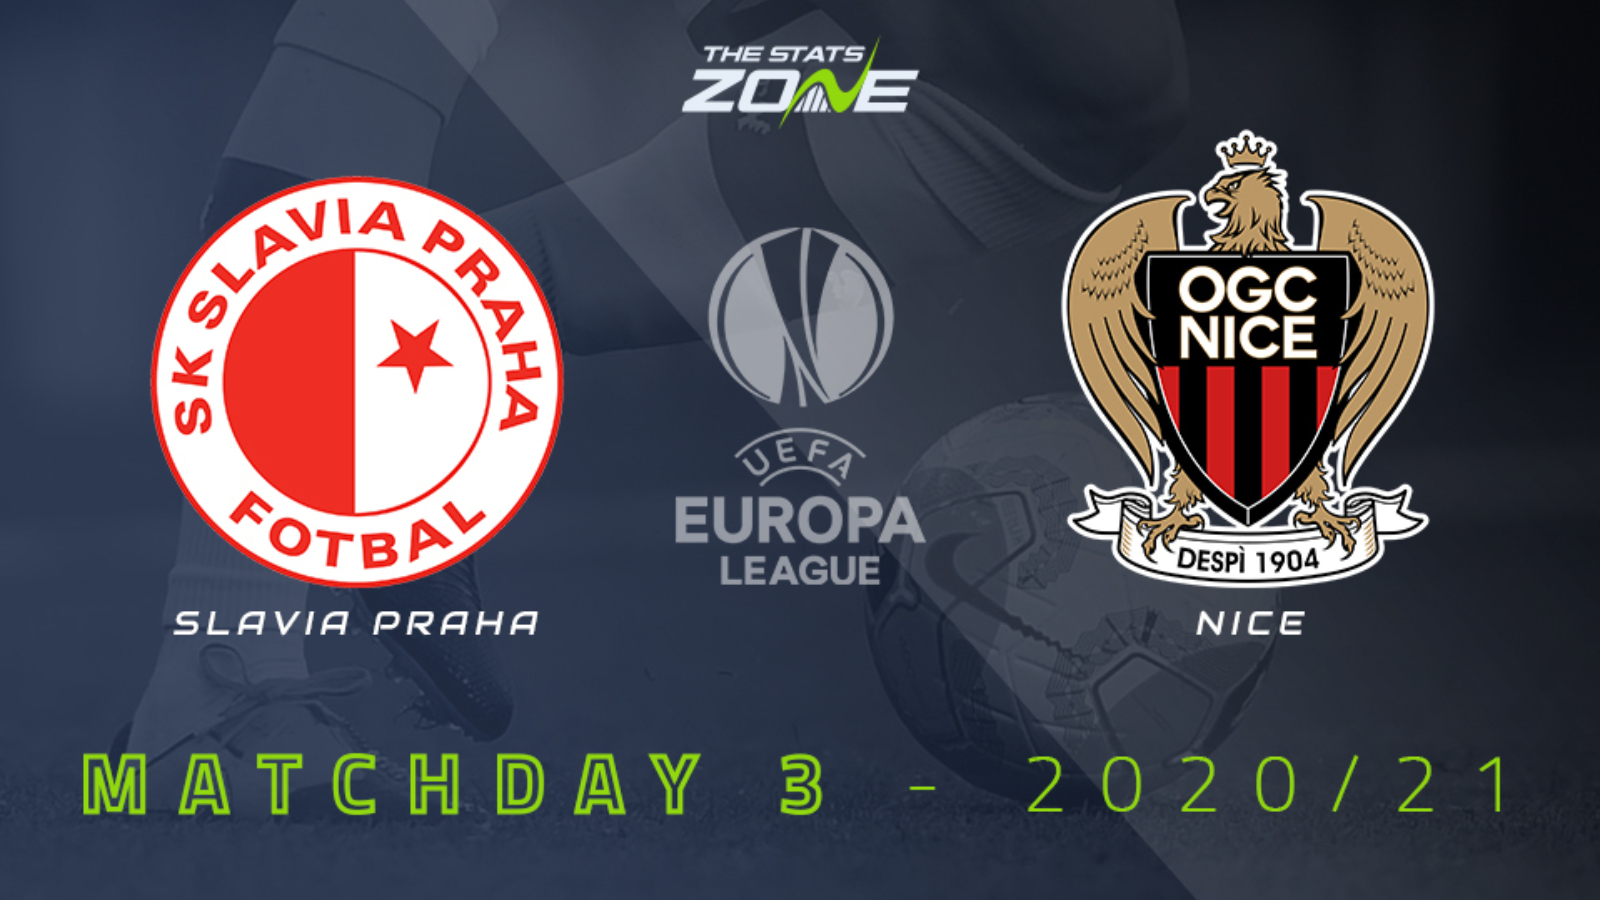 2020-21 UEFA Europa League – Slavia Praha vs Nice Preview & Prediction - The Stats Zone